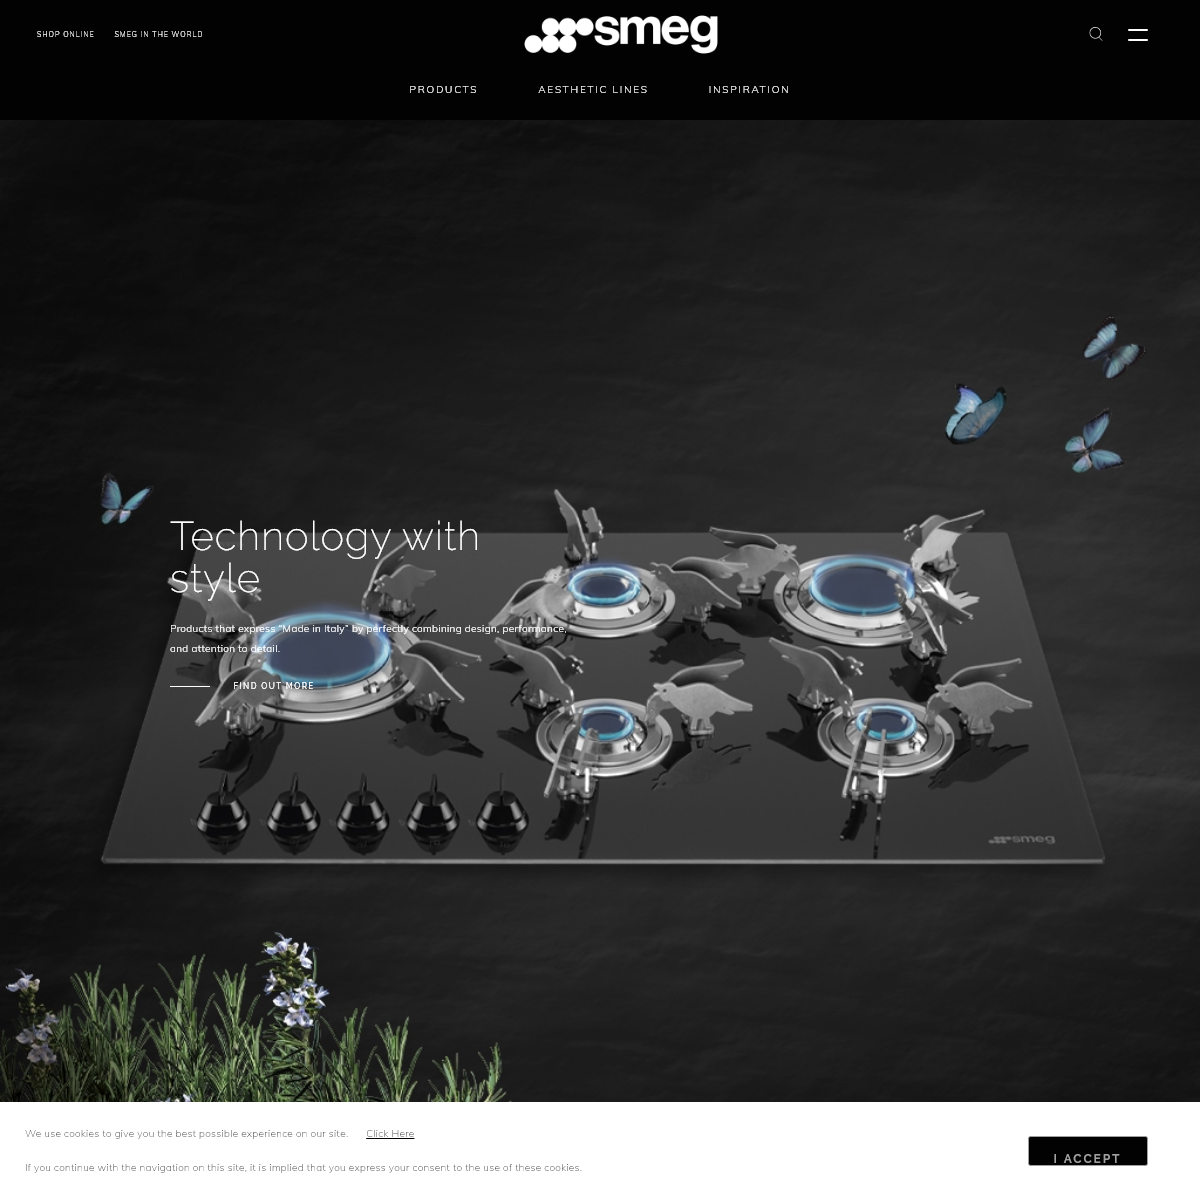 Smeg - Technology with style - Smeg.com